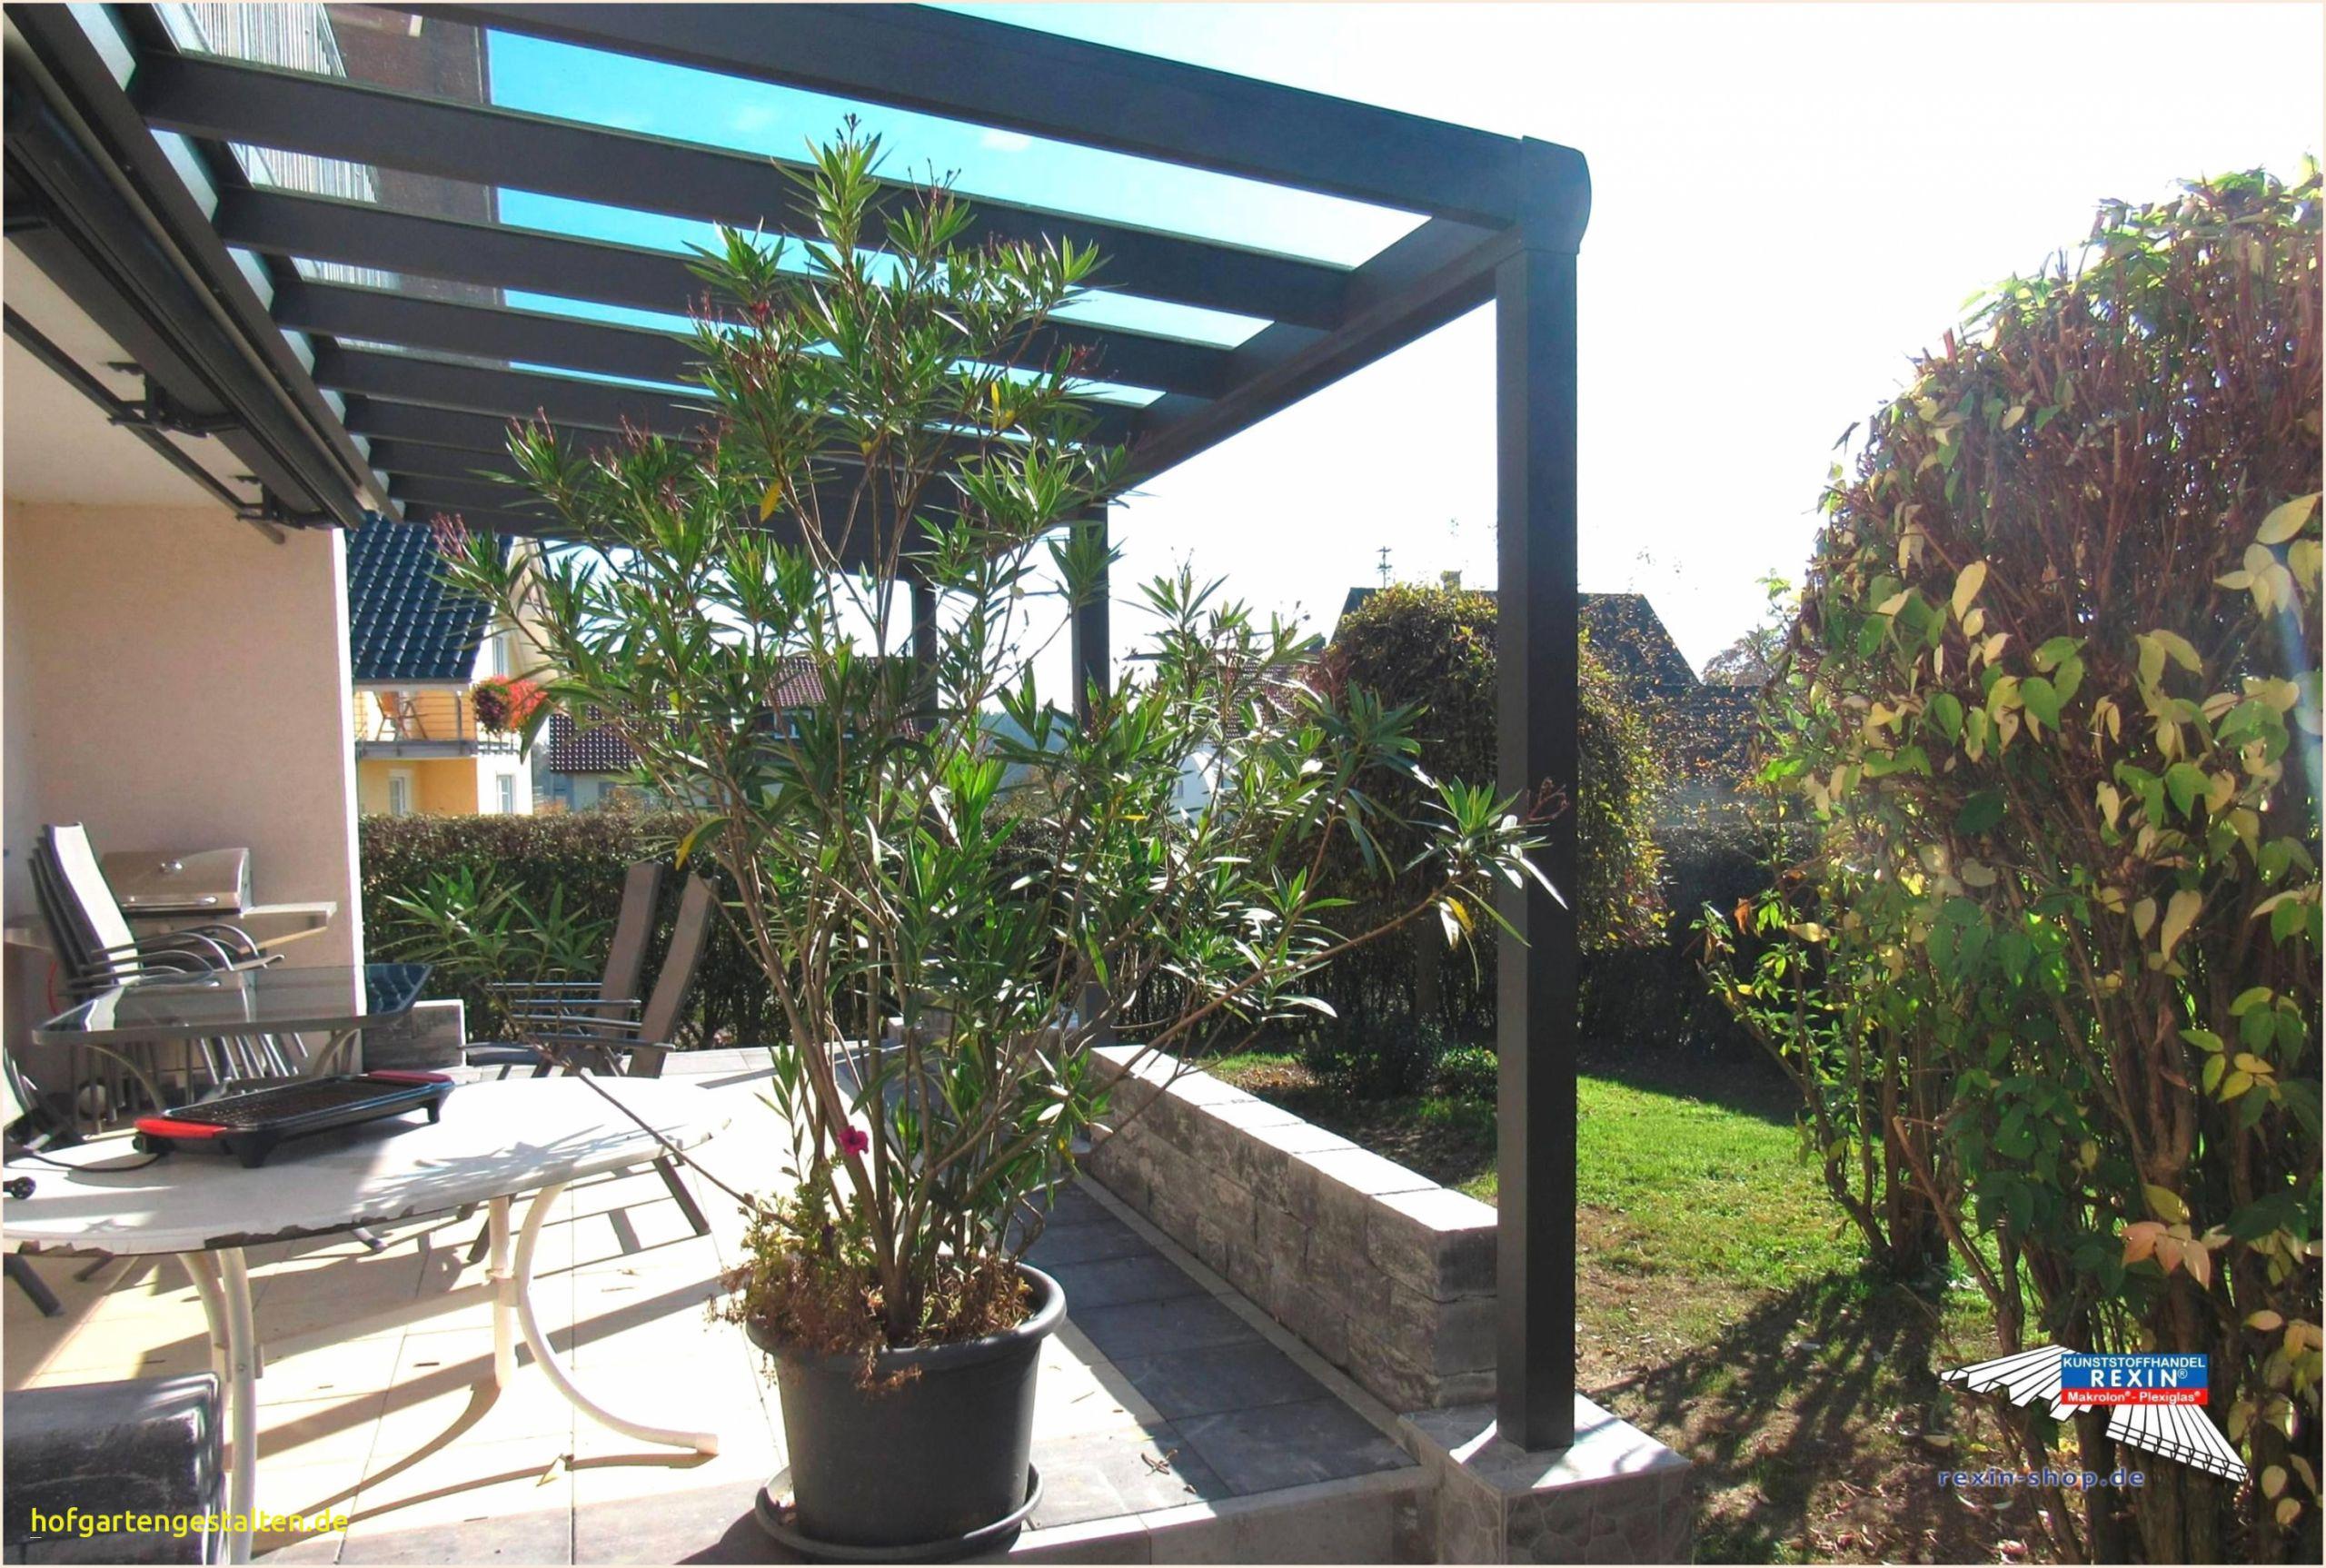 Dekoration Im Garten Best Of Deko Garten Selber Machen — Temobardz Home Blog